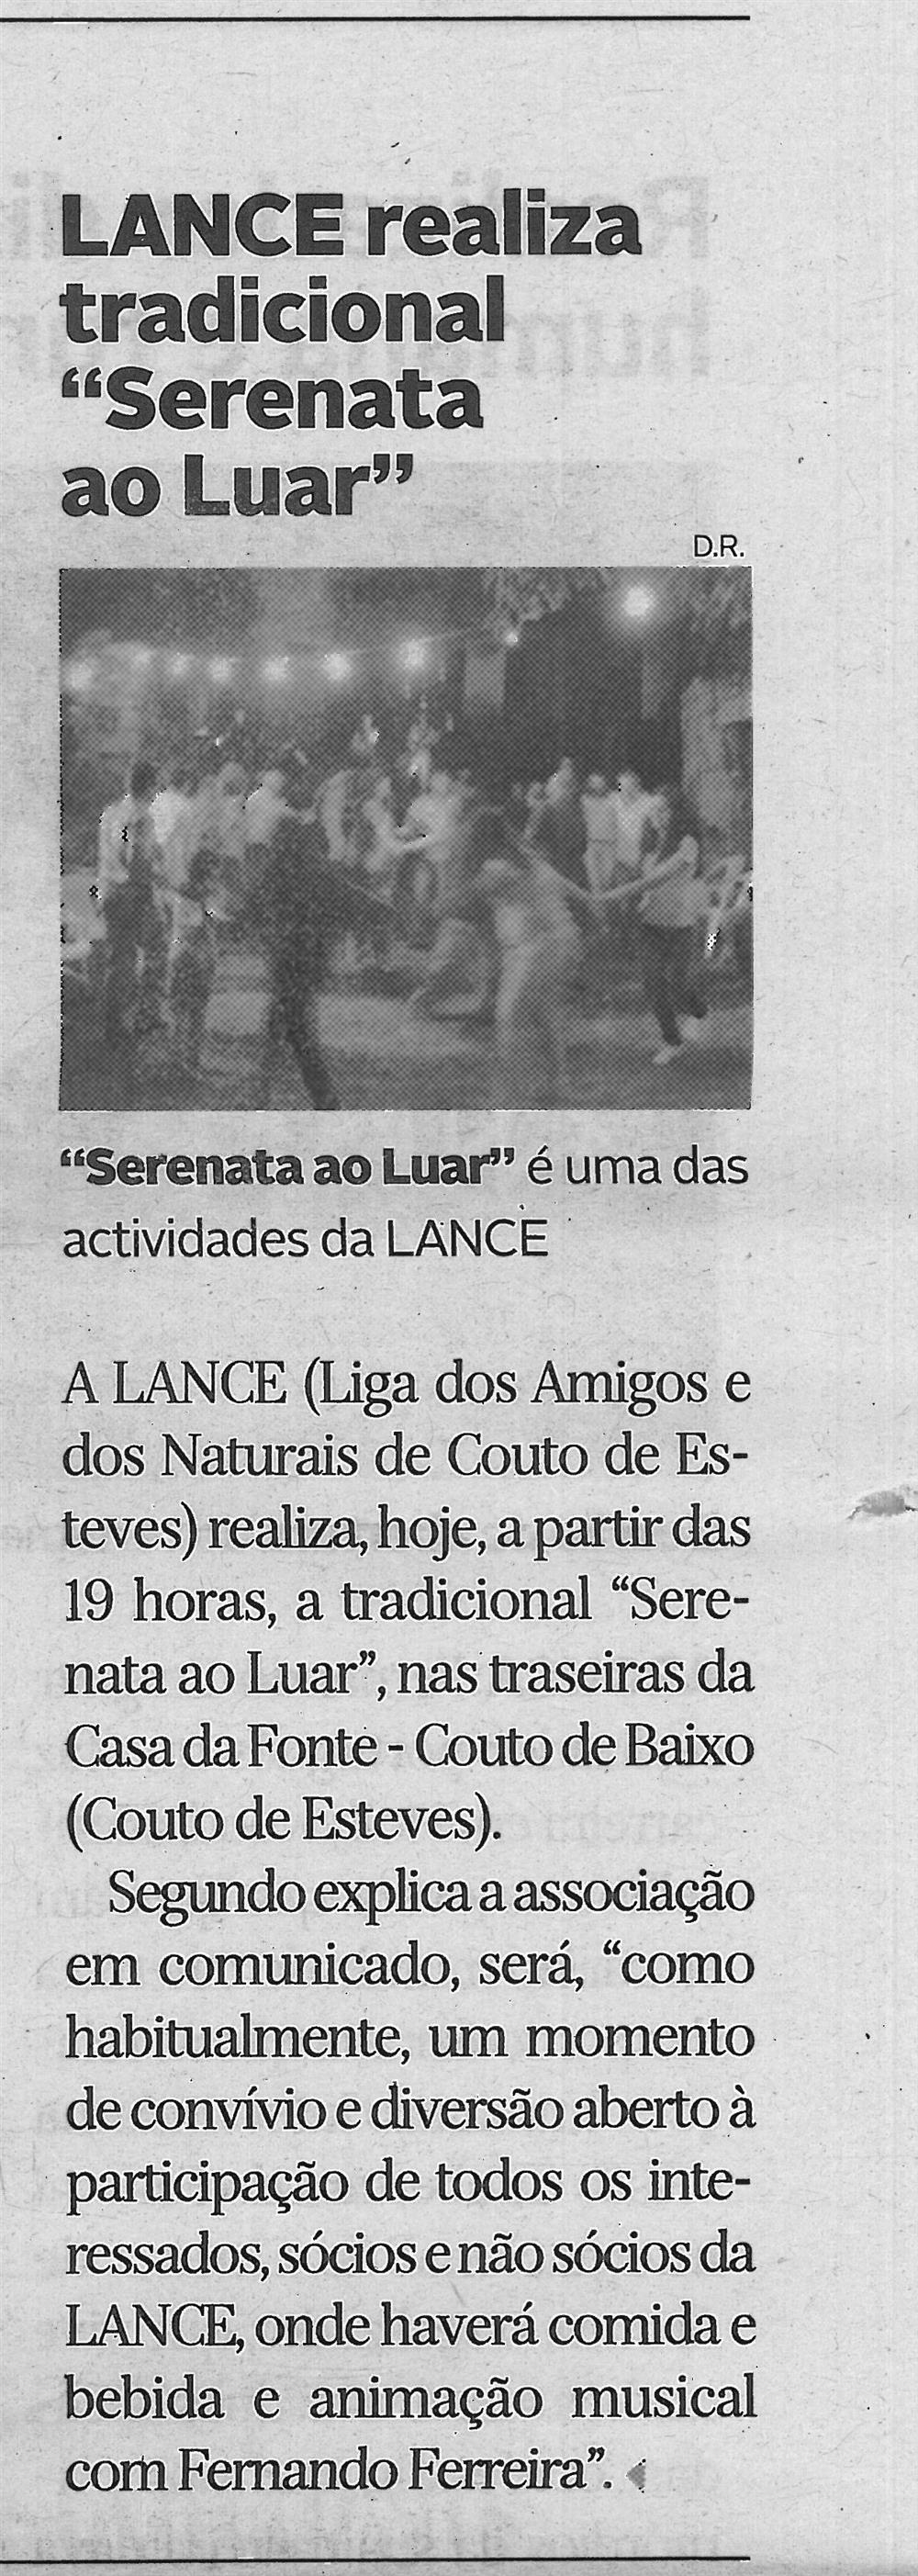 DA-10set.'16-p.19-LANCE realiza tradicional Serenata ao Luar.jpg